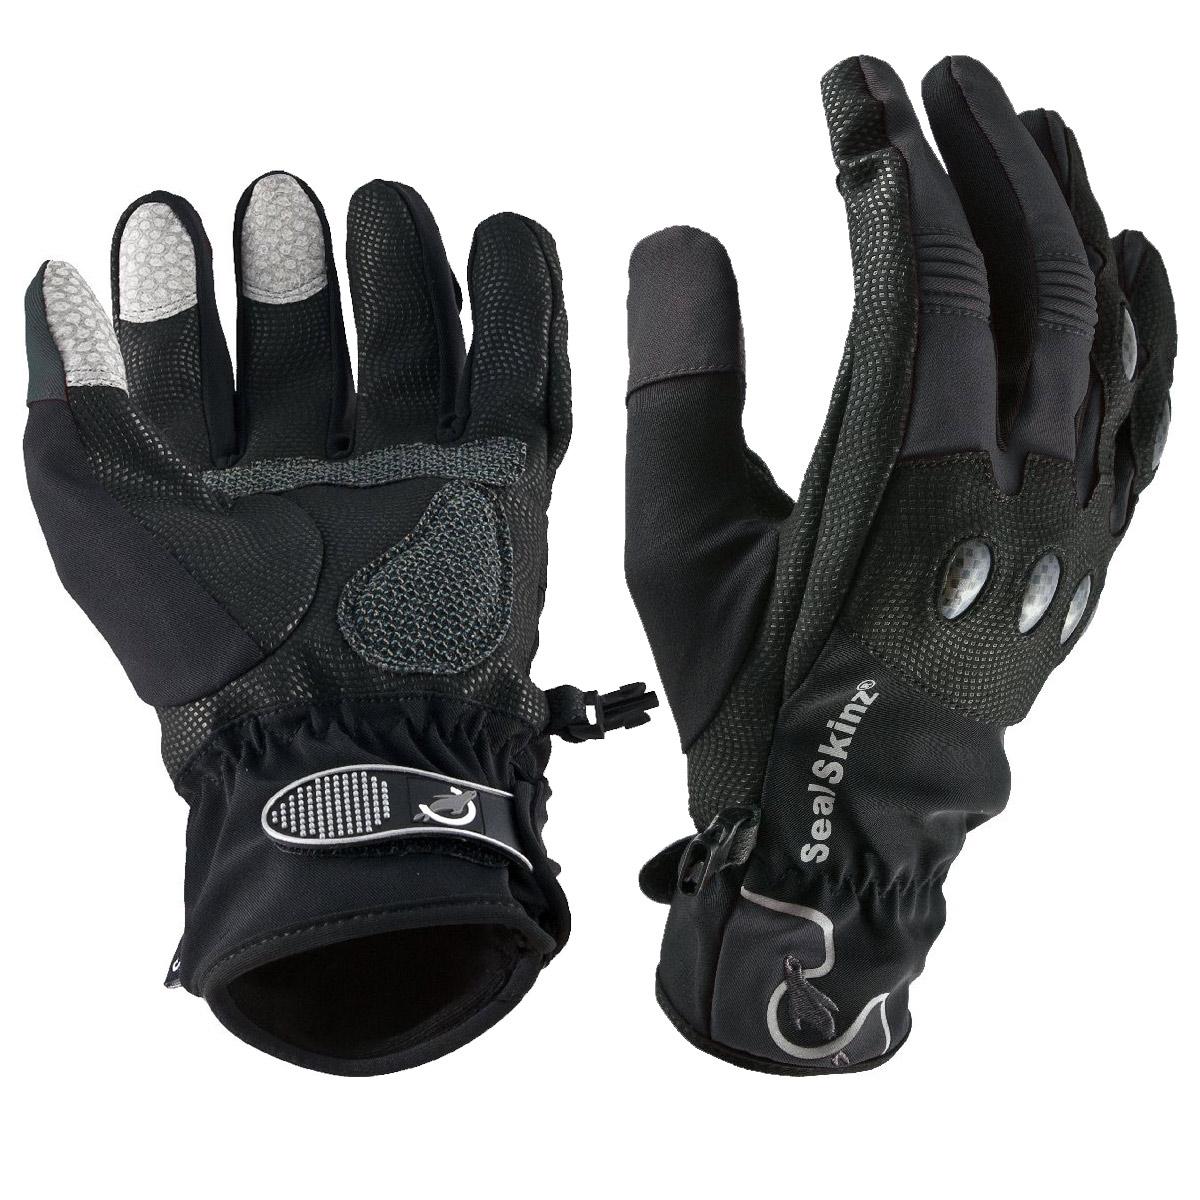 Motorcycle gloves large - Image Of Sealskinz Lightweight Motorcycle Gloves Black Grey